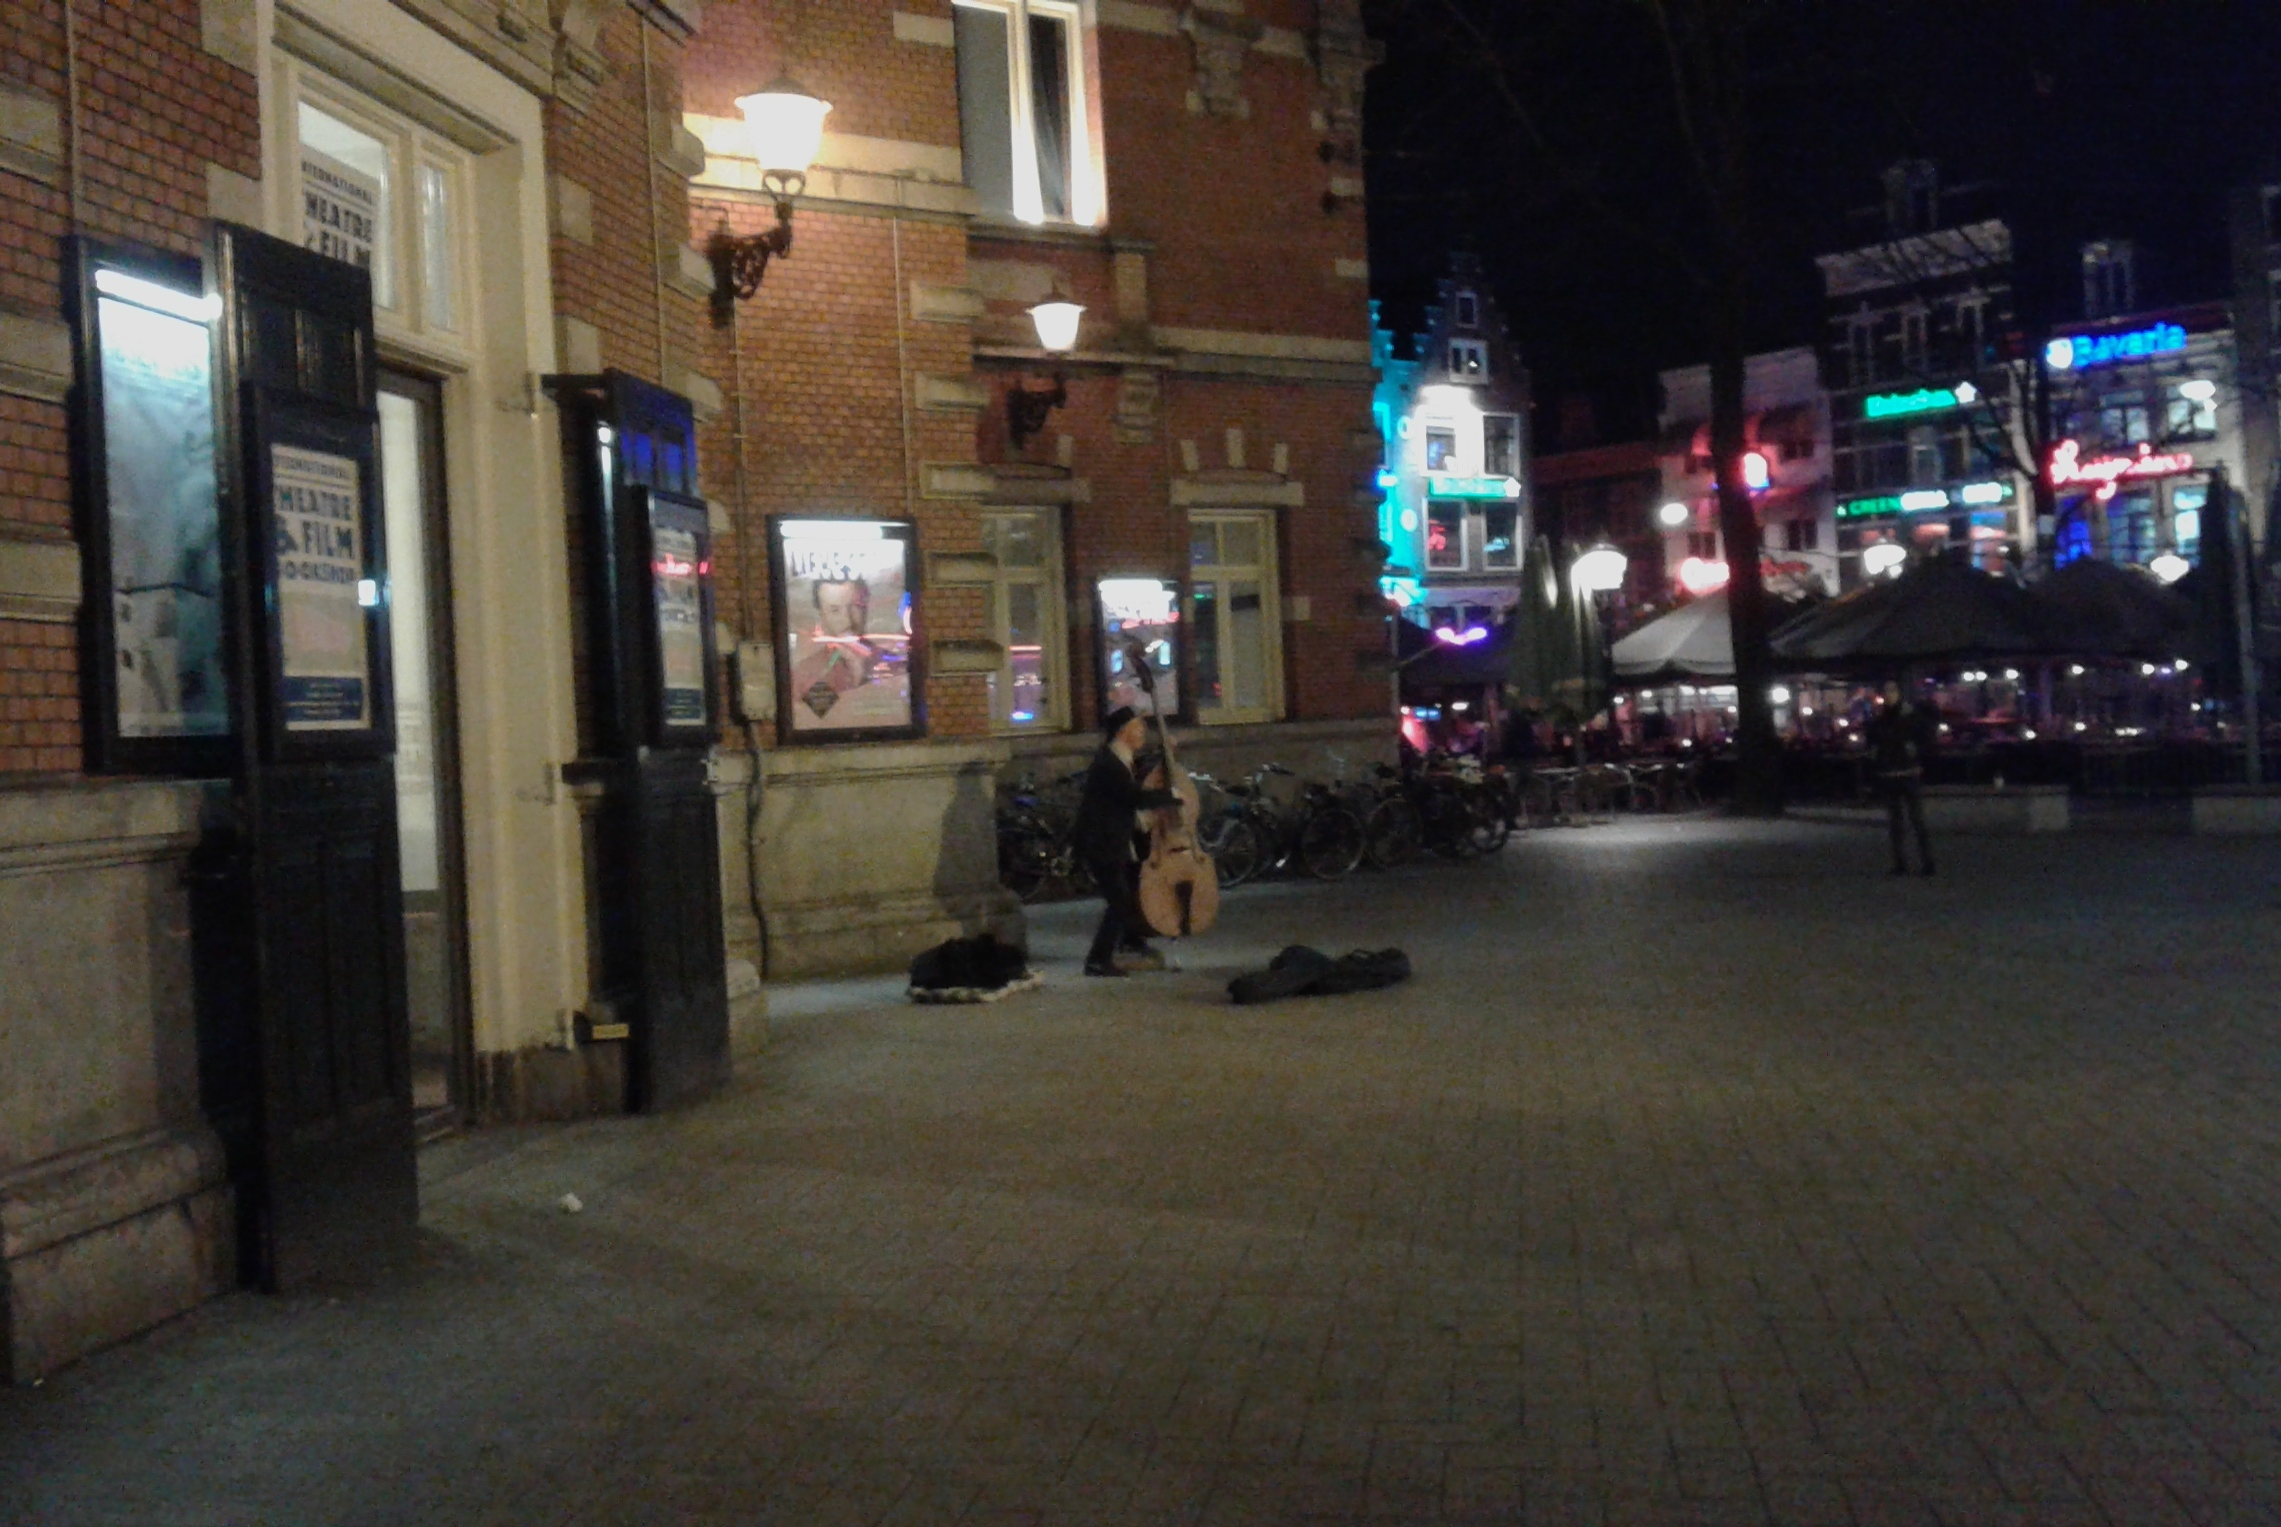 STREET SOUNDS (FOTO 3)